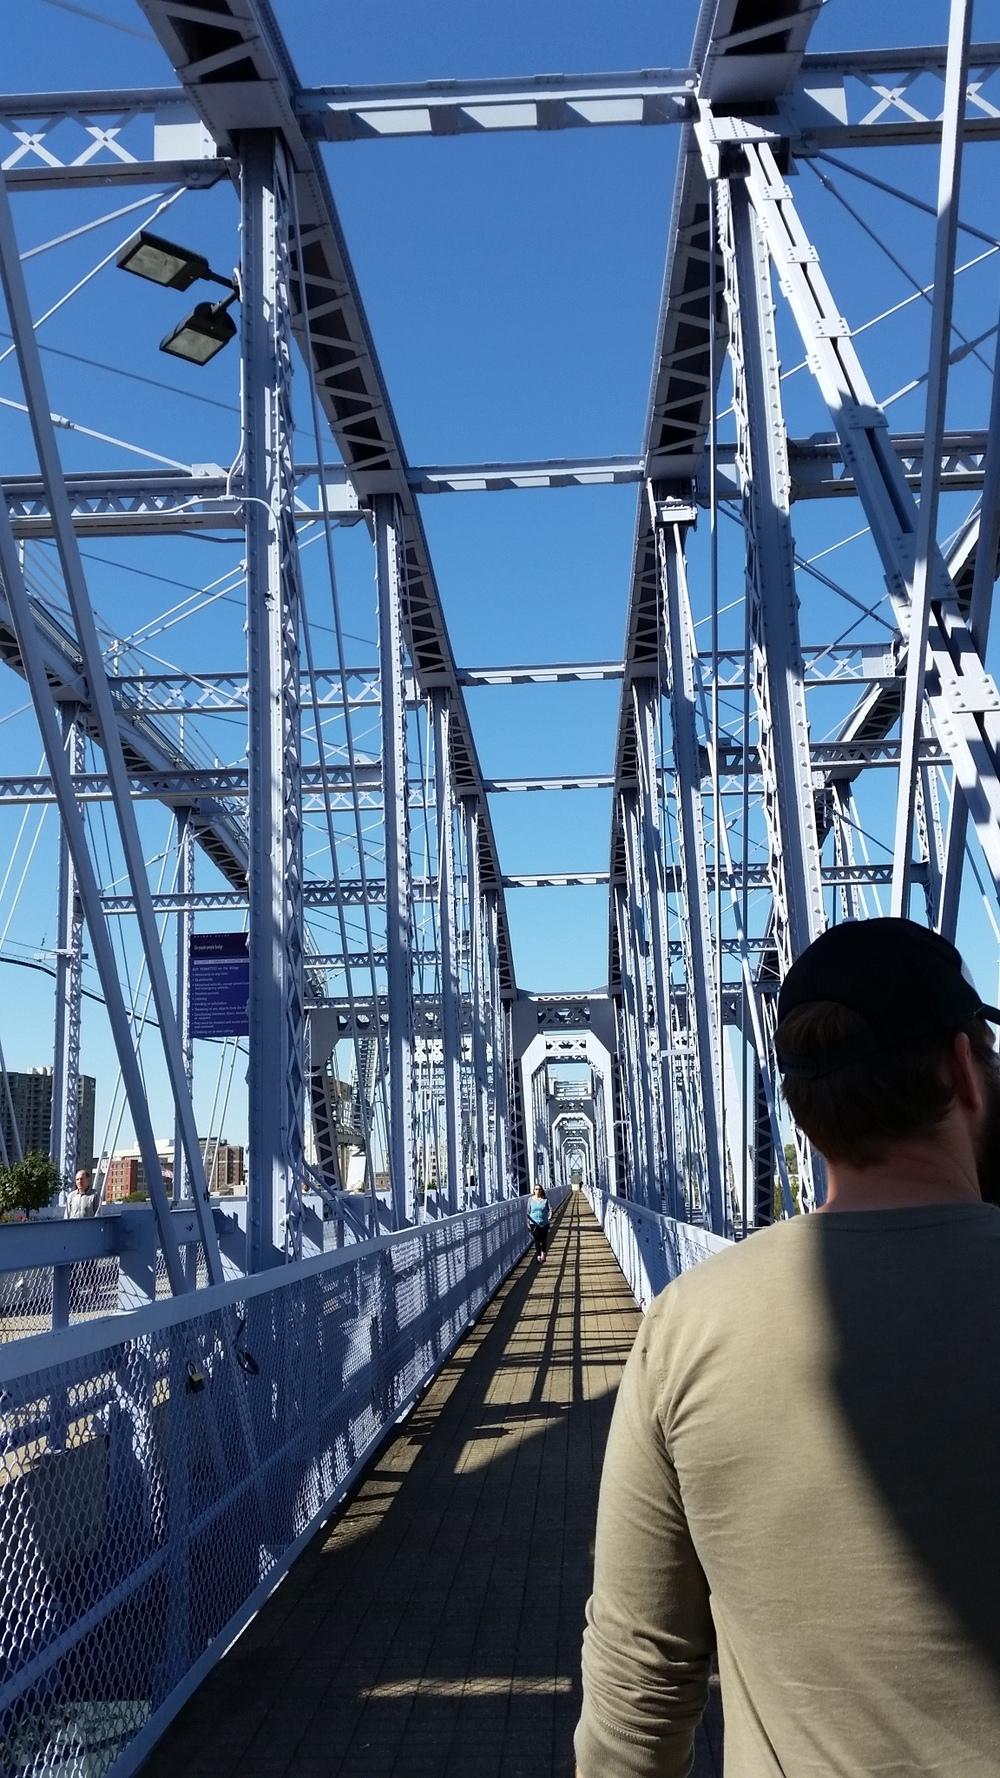 Walking the Purple People Eater bridge in Cincinnati, Ohio